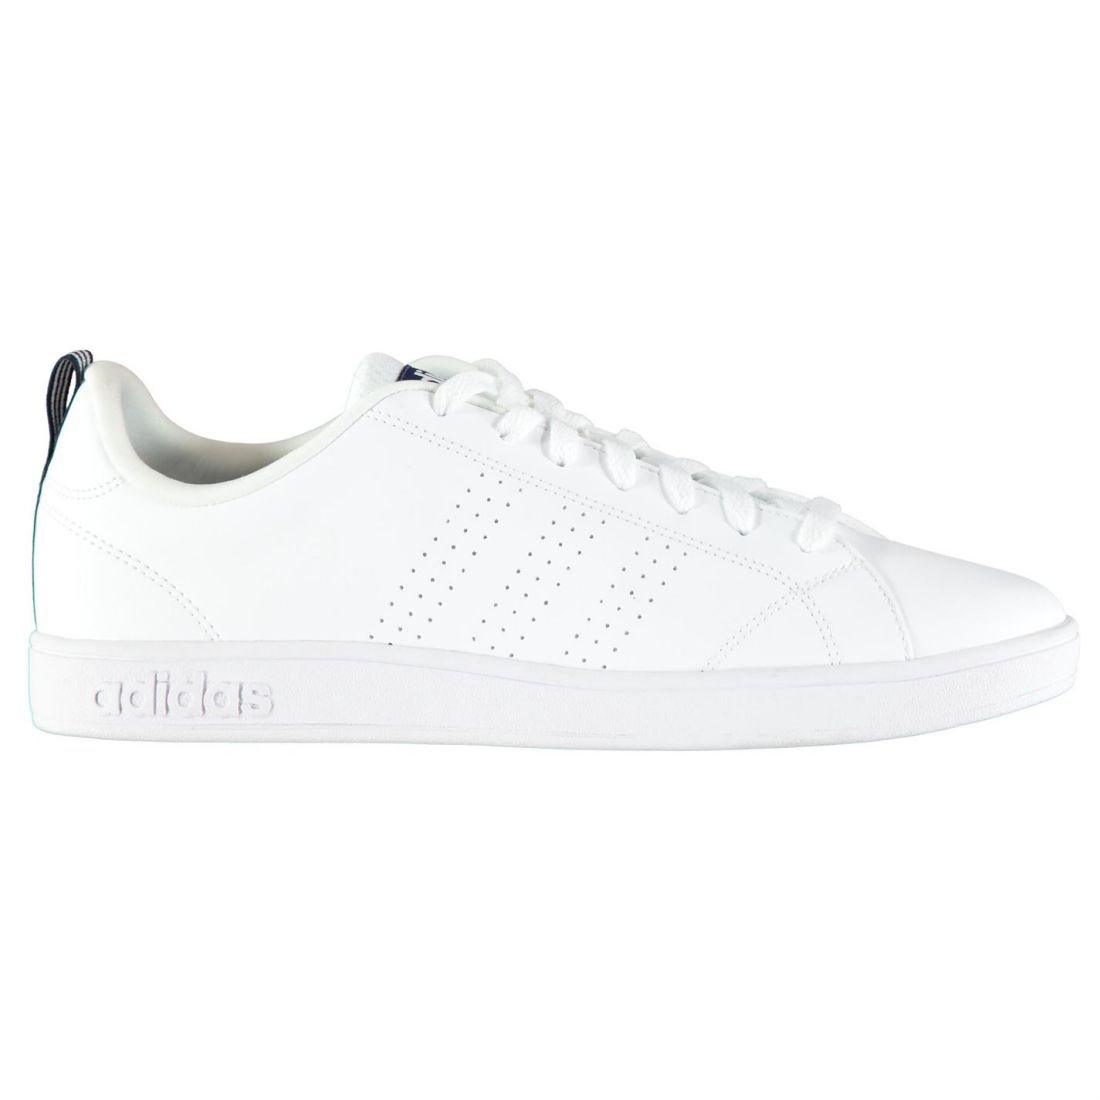 adidas Neo Label Advantage Clean VS Black Mens Casual Shoes Trainers F99253 UK 9